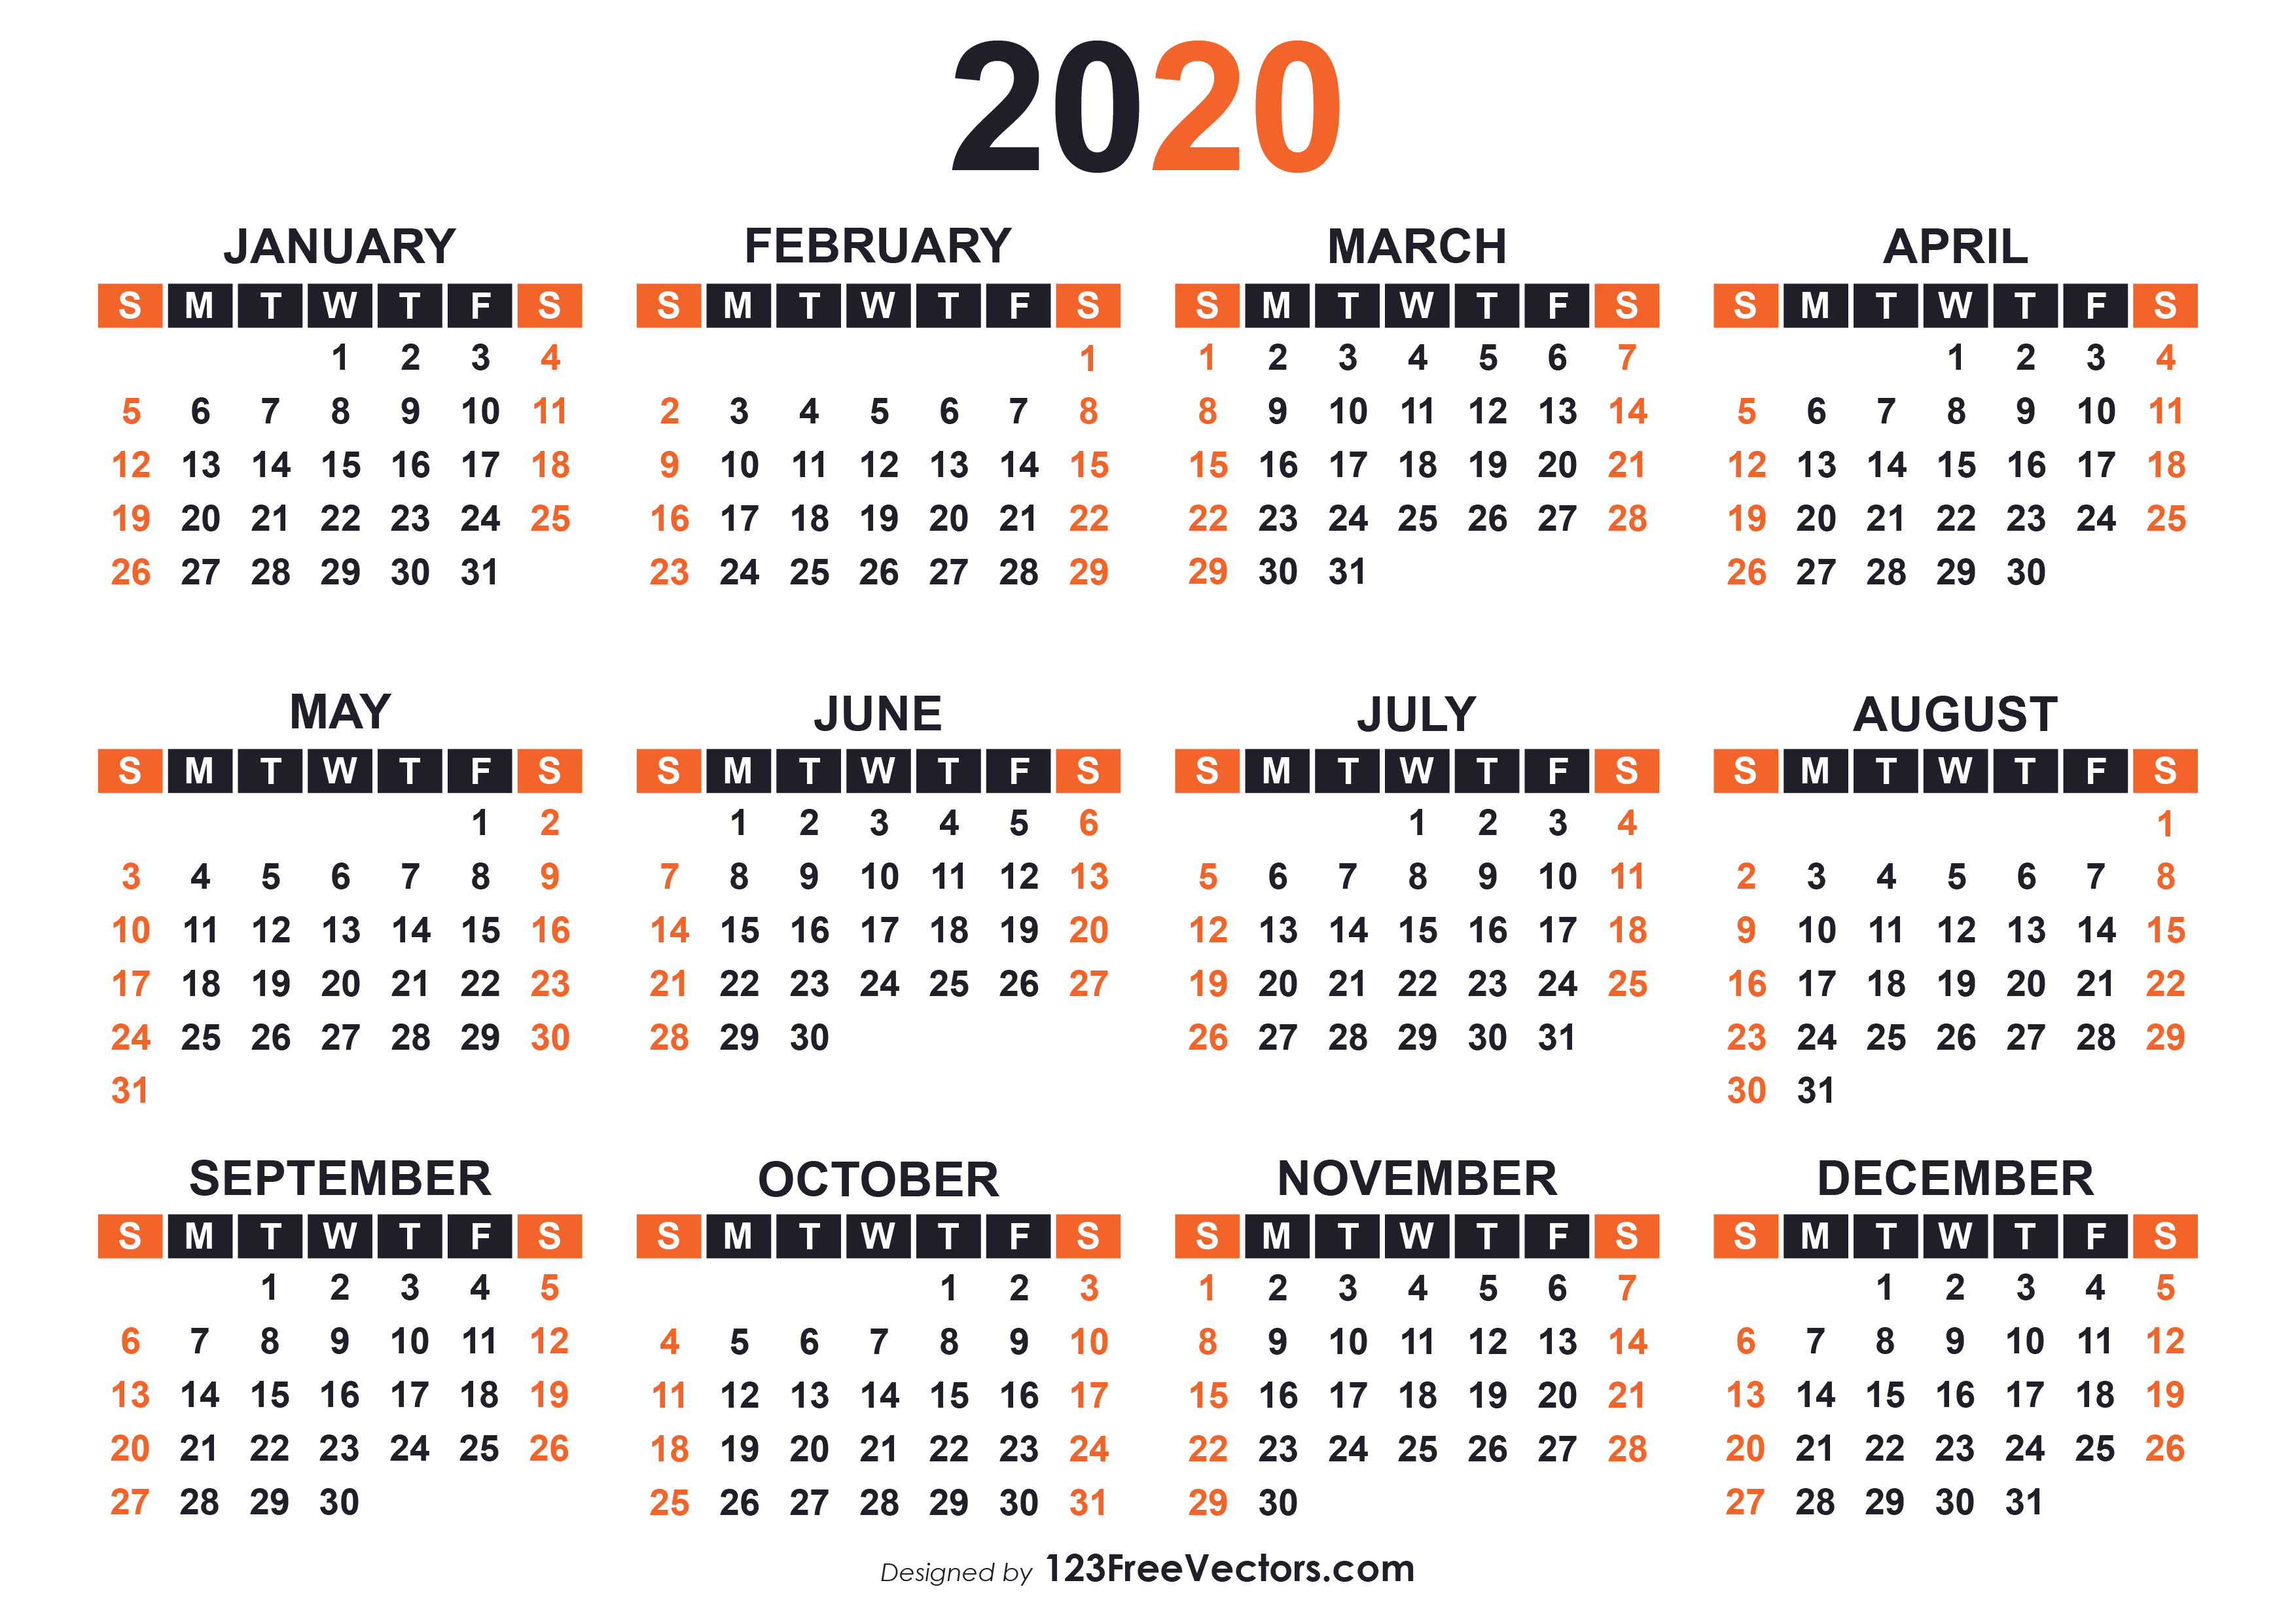 2020 Free Printable Calendar Templates pertaining to Large Numbers Free Printable Calendar 2020